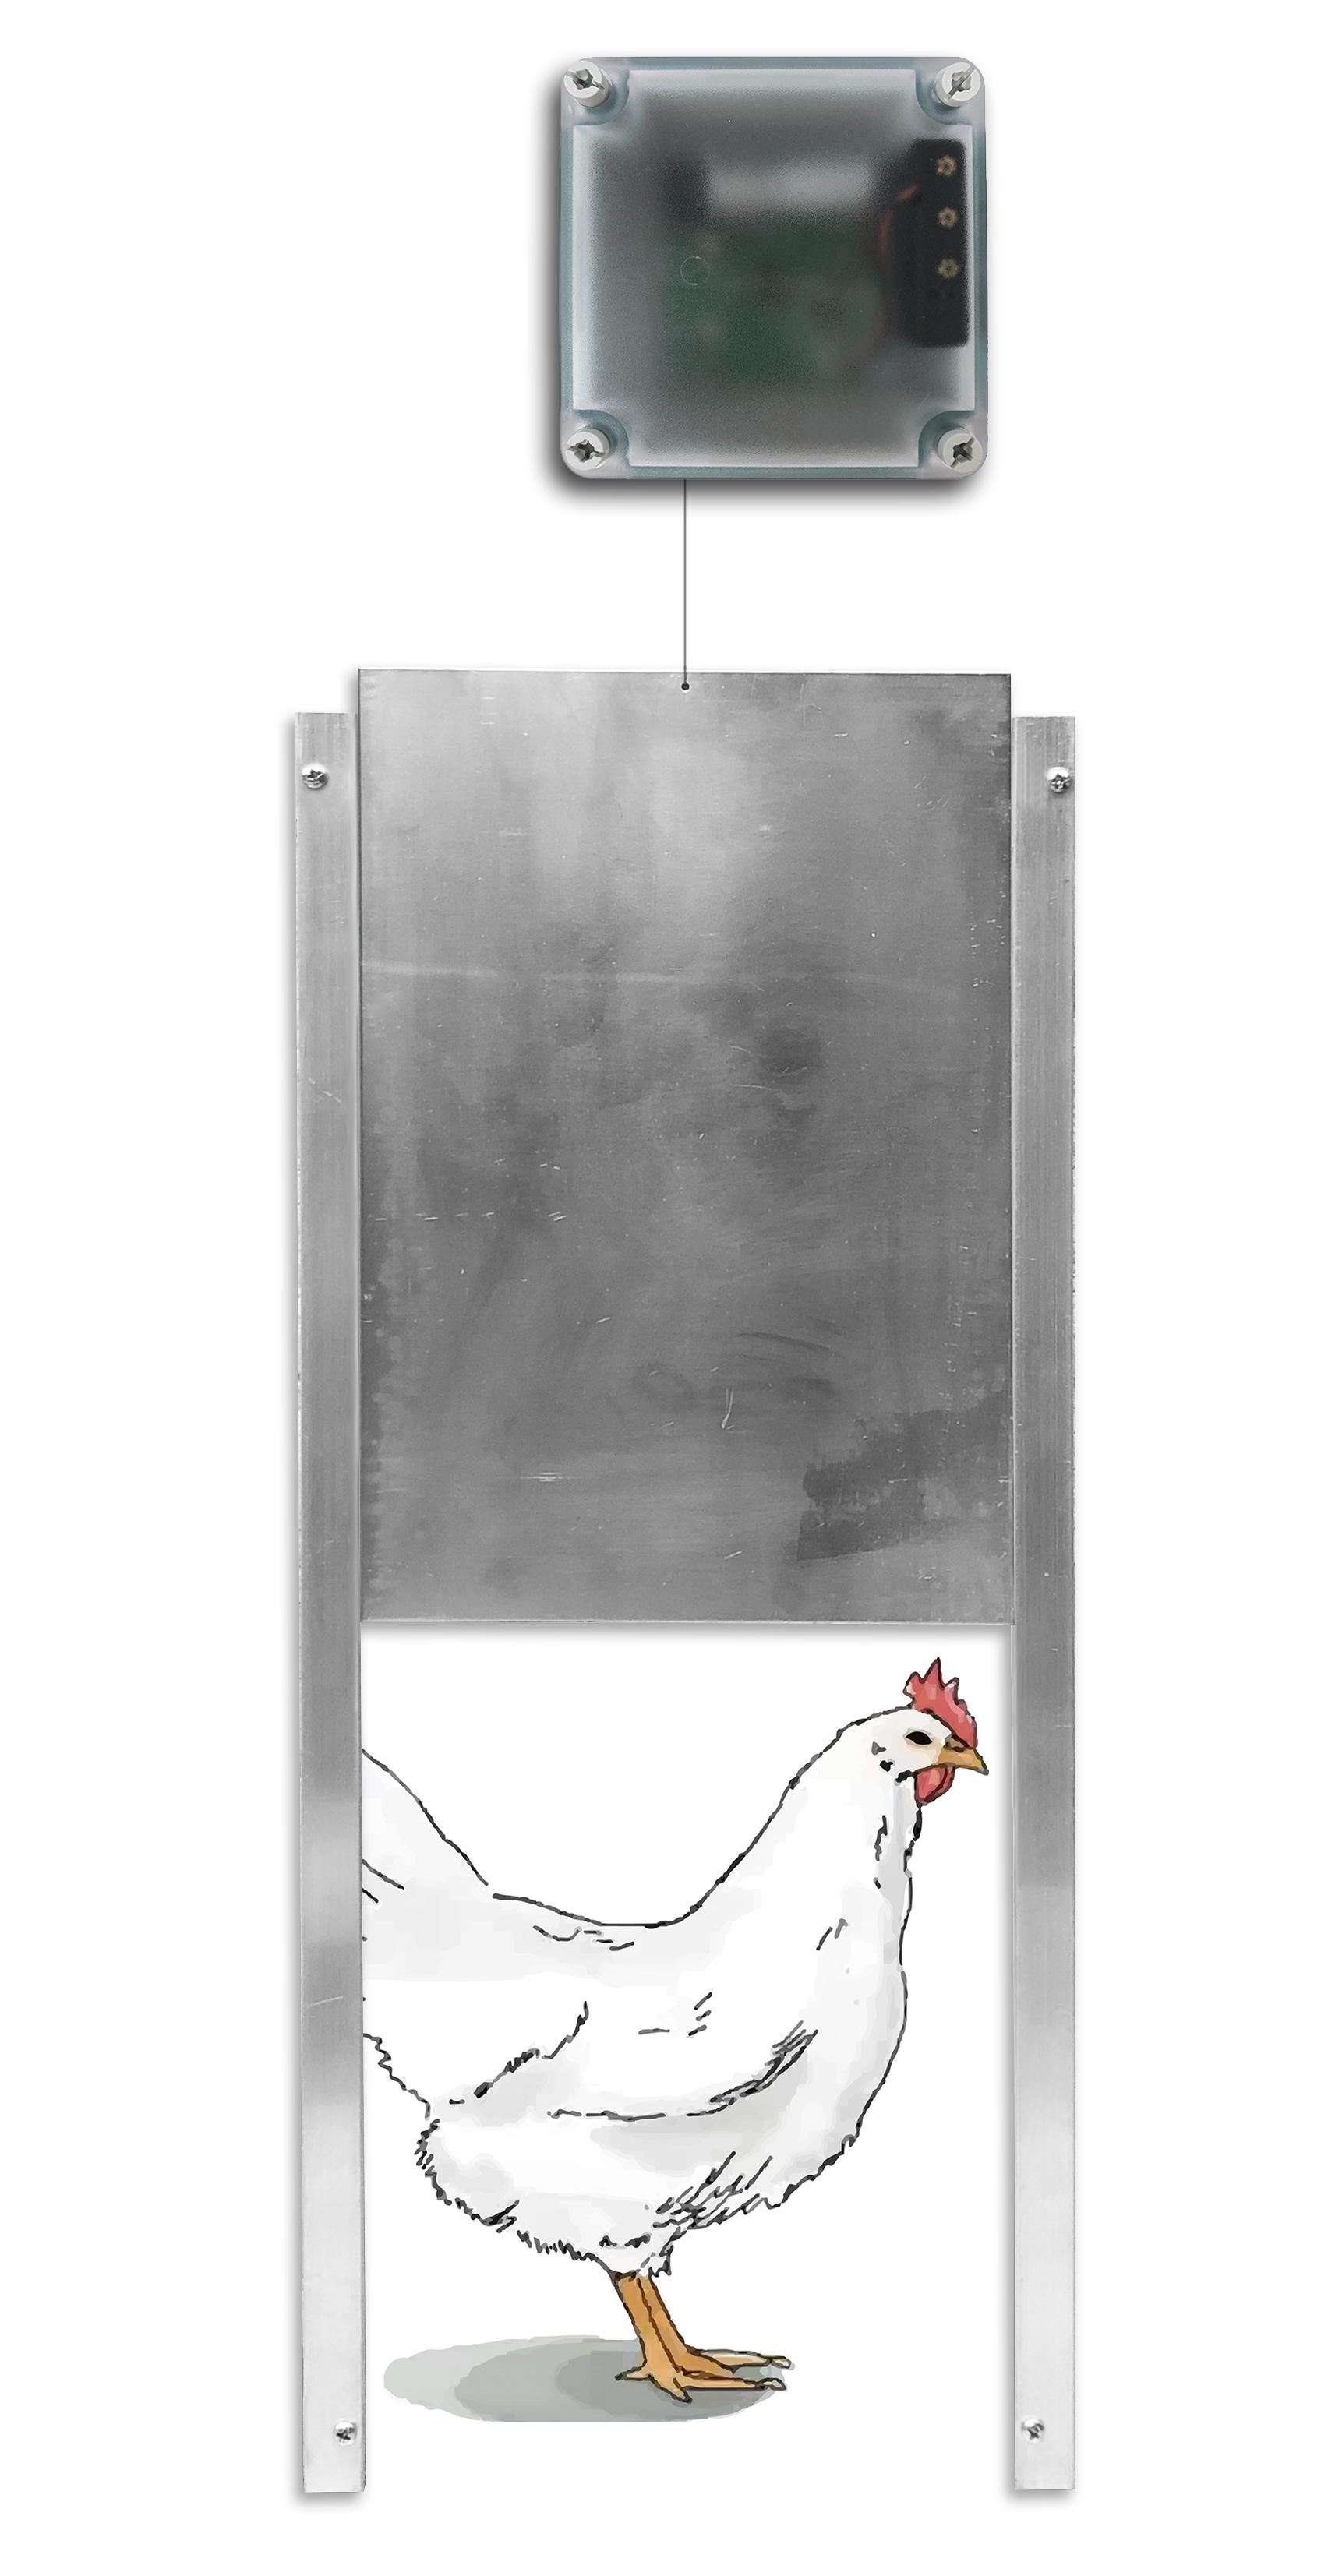 Automatic Door (Timer & Light)